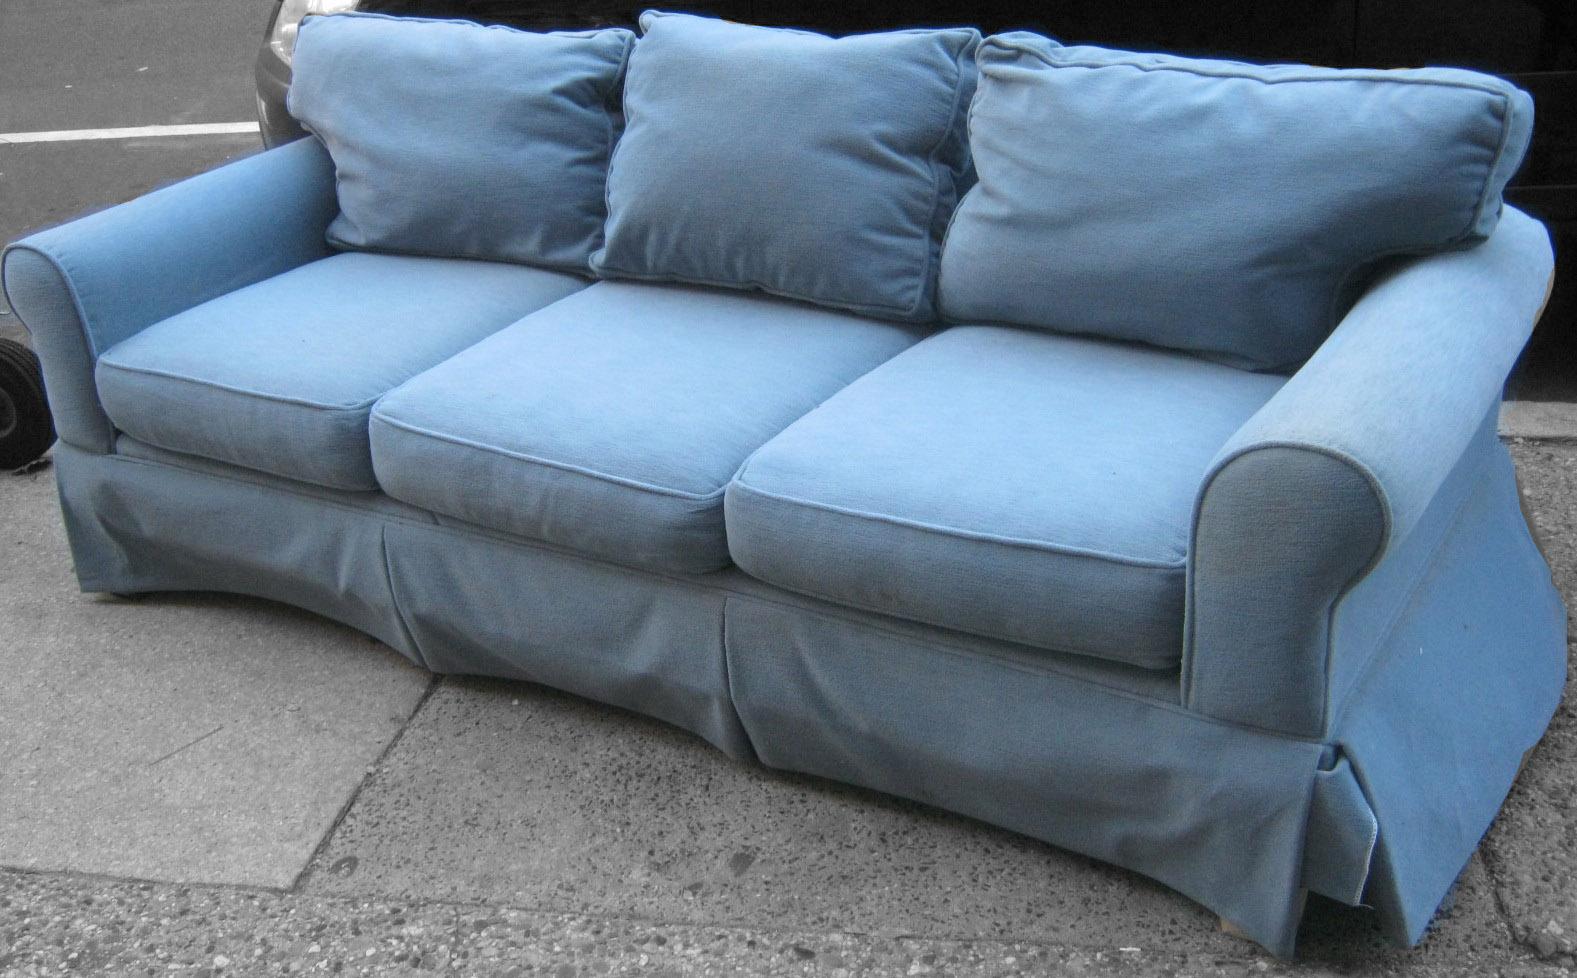 Uhuru Furniture & Collectibles: Light Blue Sofa SOLD